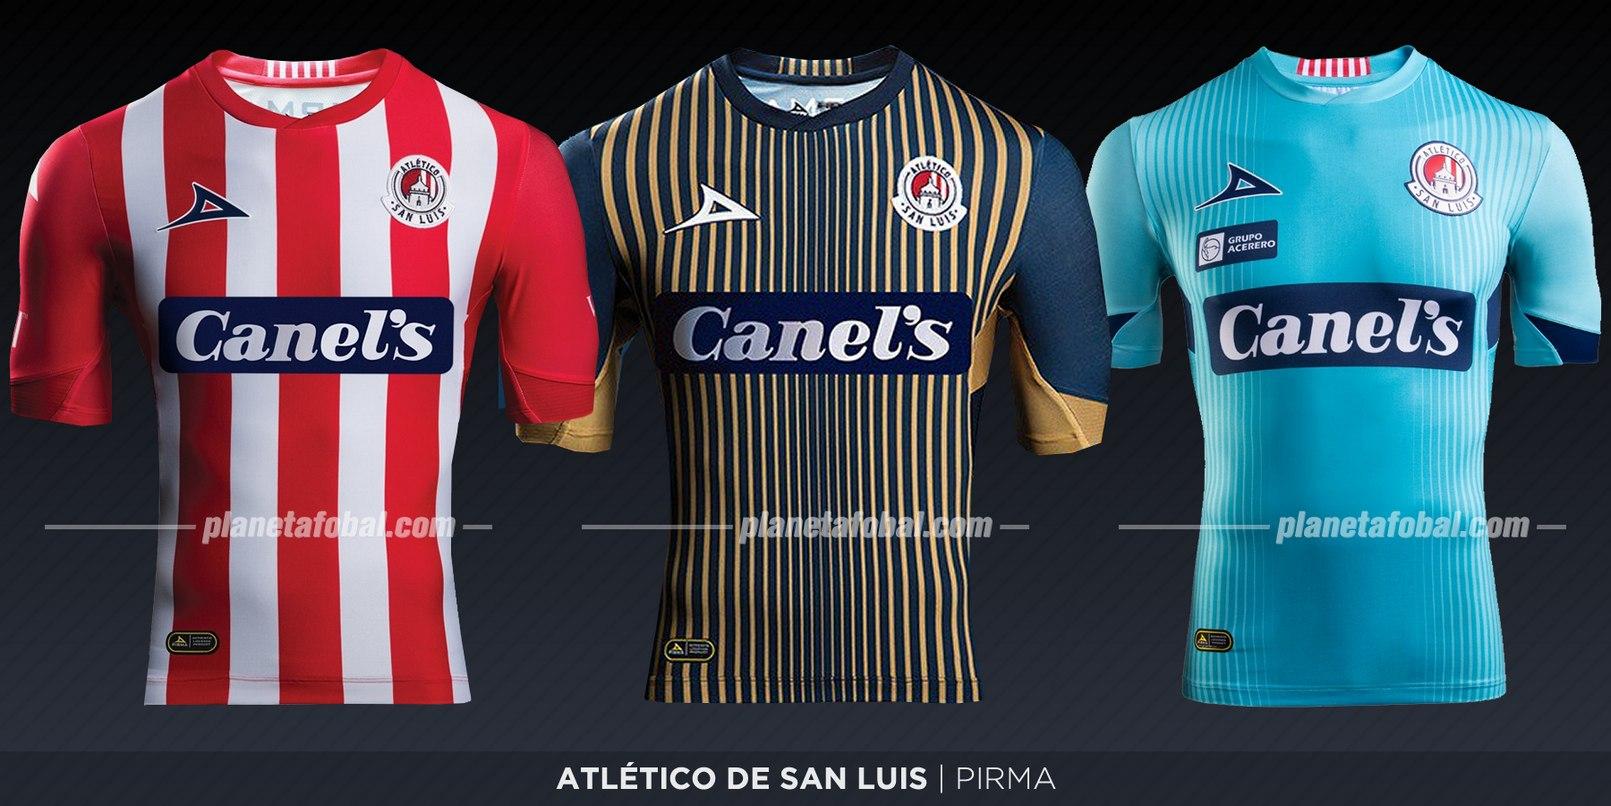 Atlético de San Luis (Pirma) | Camisetas de la Liga MX 2019-2020